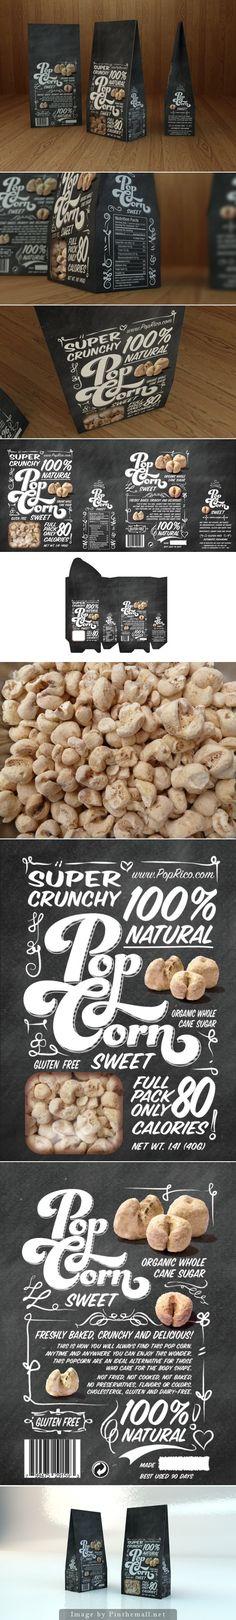 Sweet Popcorn | Fabricio Hauen